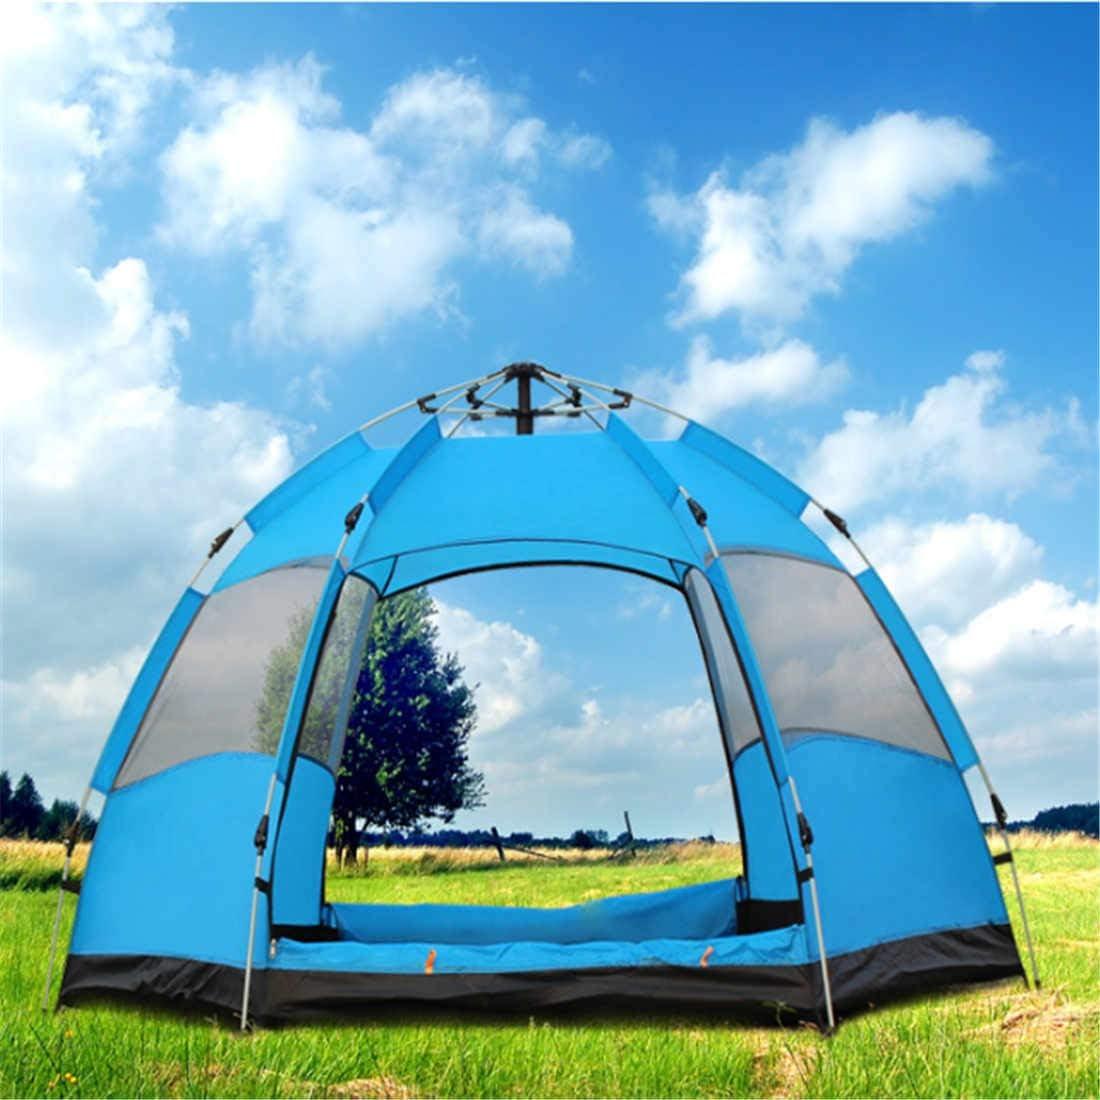 5-8 Persona automática de Doble Capa Hexagonal Carpa Camping al Aire Libre a Prueba de Lluvia Carpa Double hexagon